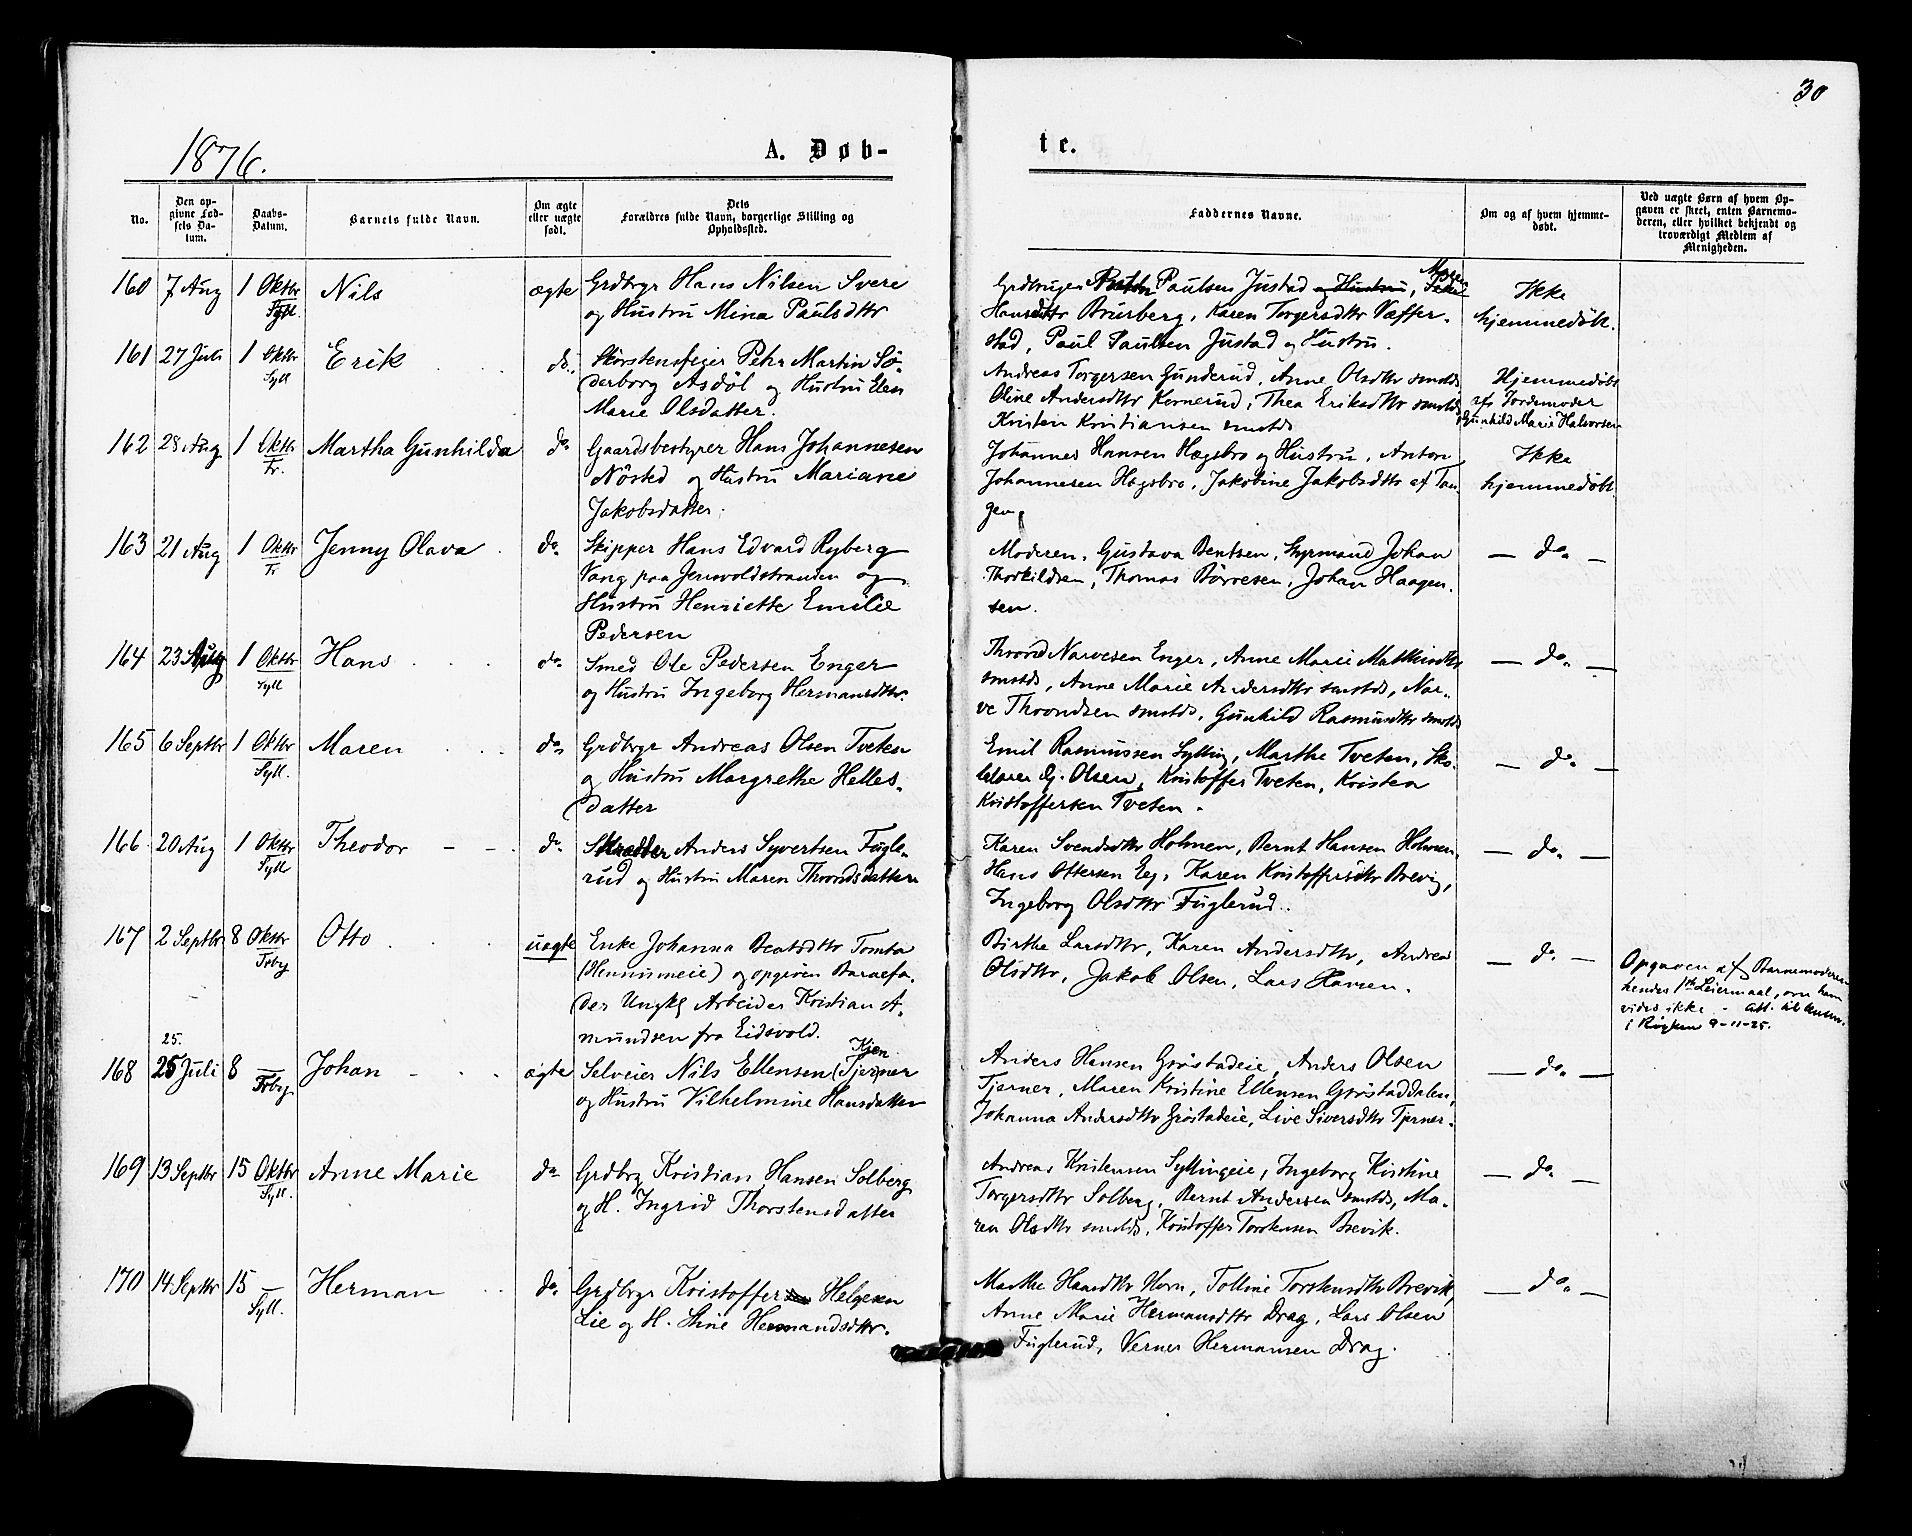 SAKO, Lier kirkebøker, F/Fa/L0014: Ministerialbok nr. I 14, 1875-1882, s. 30